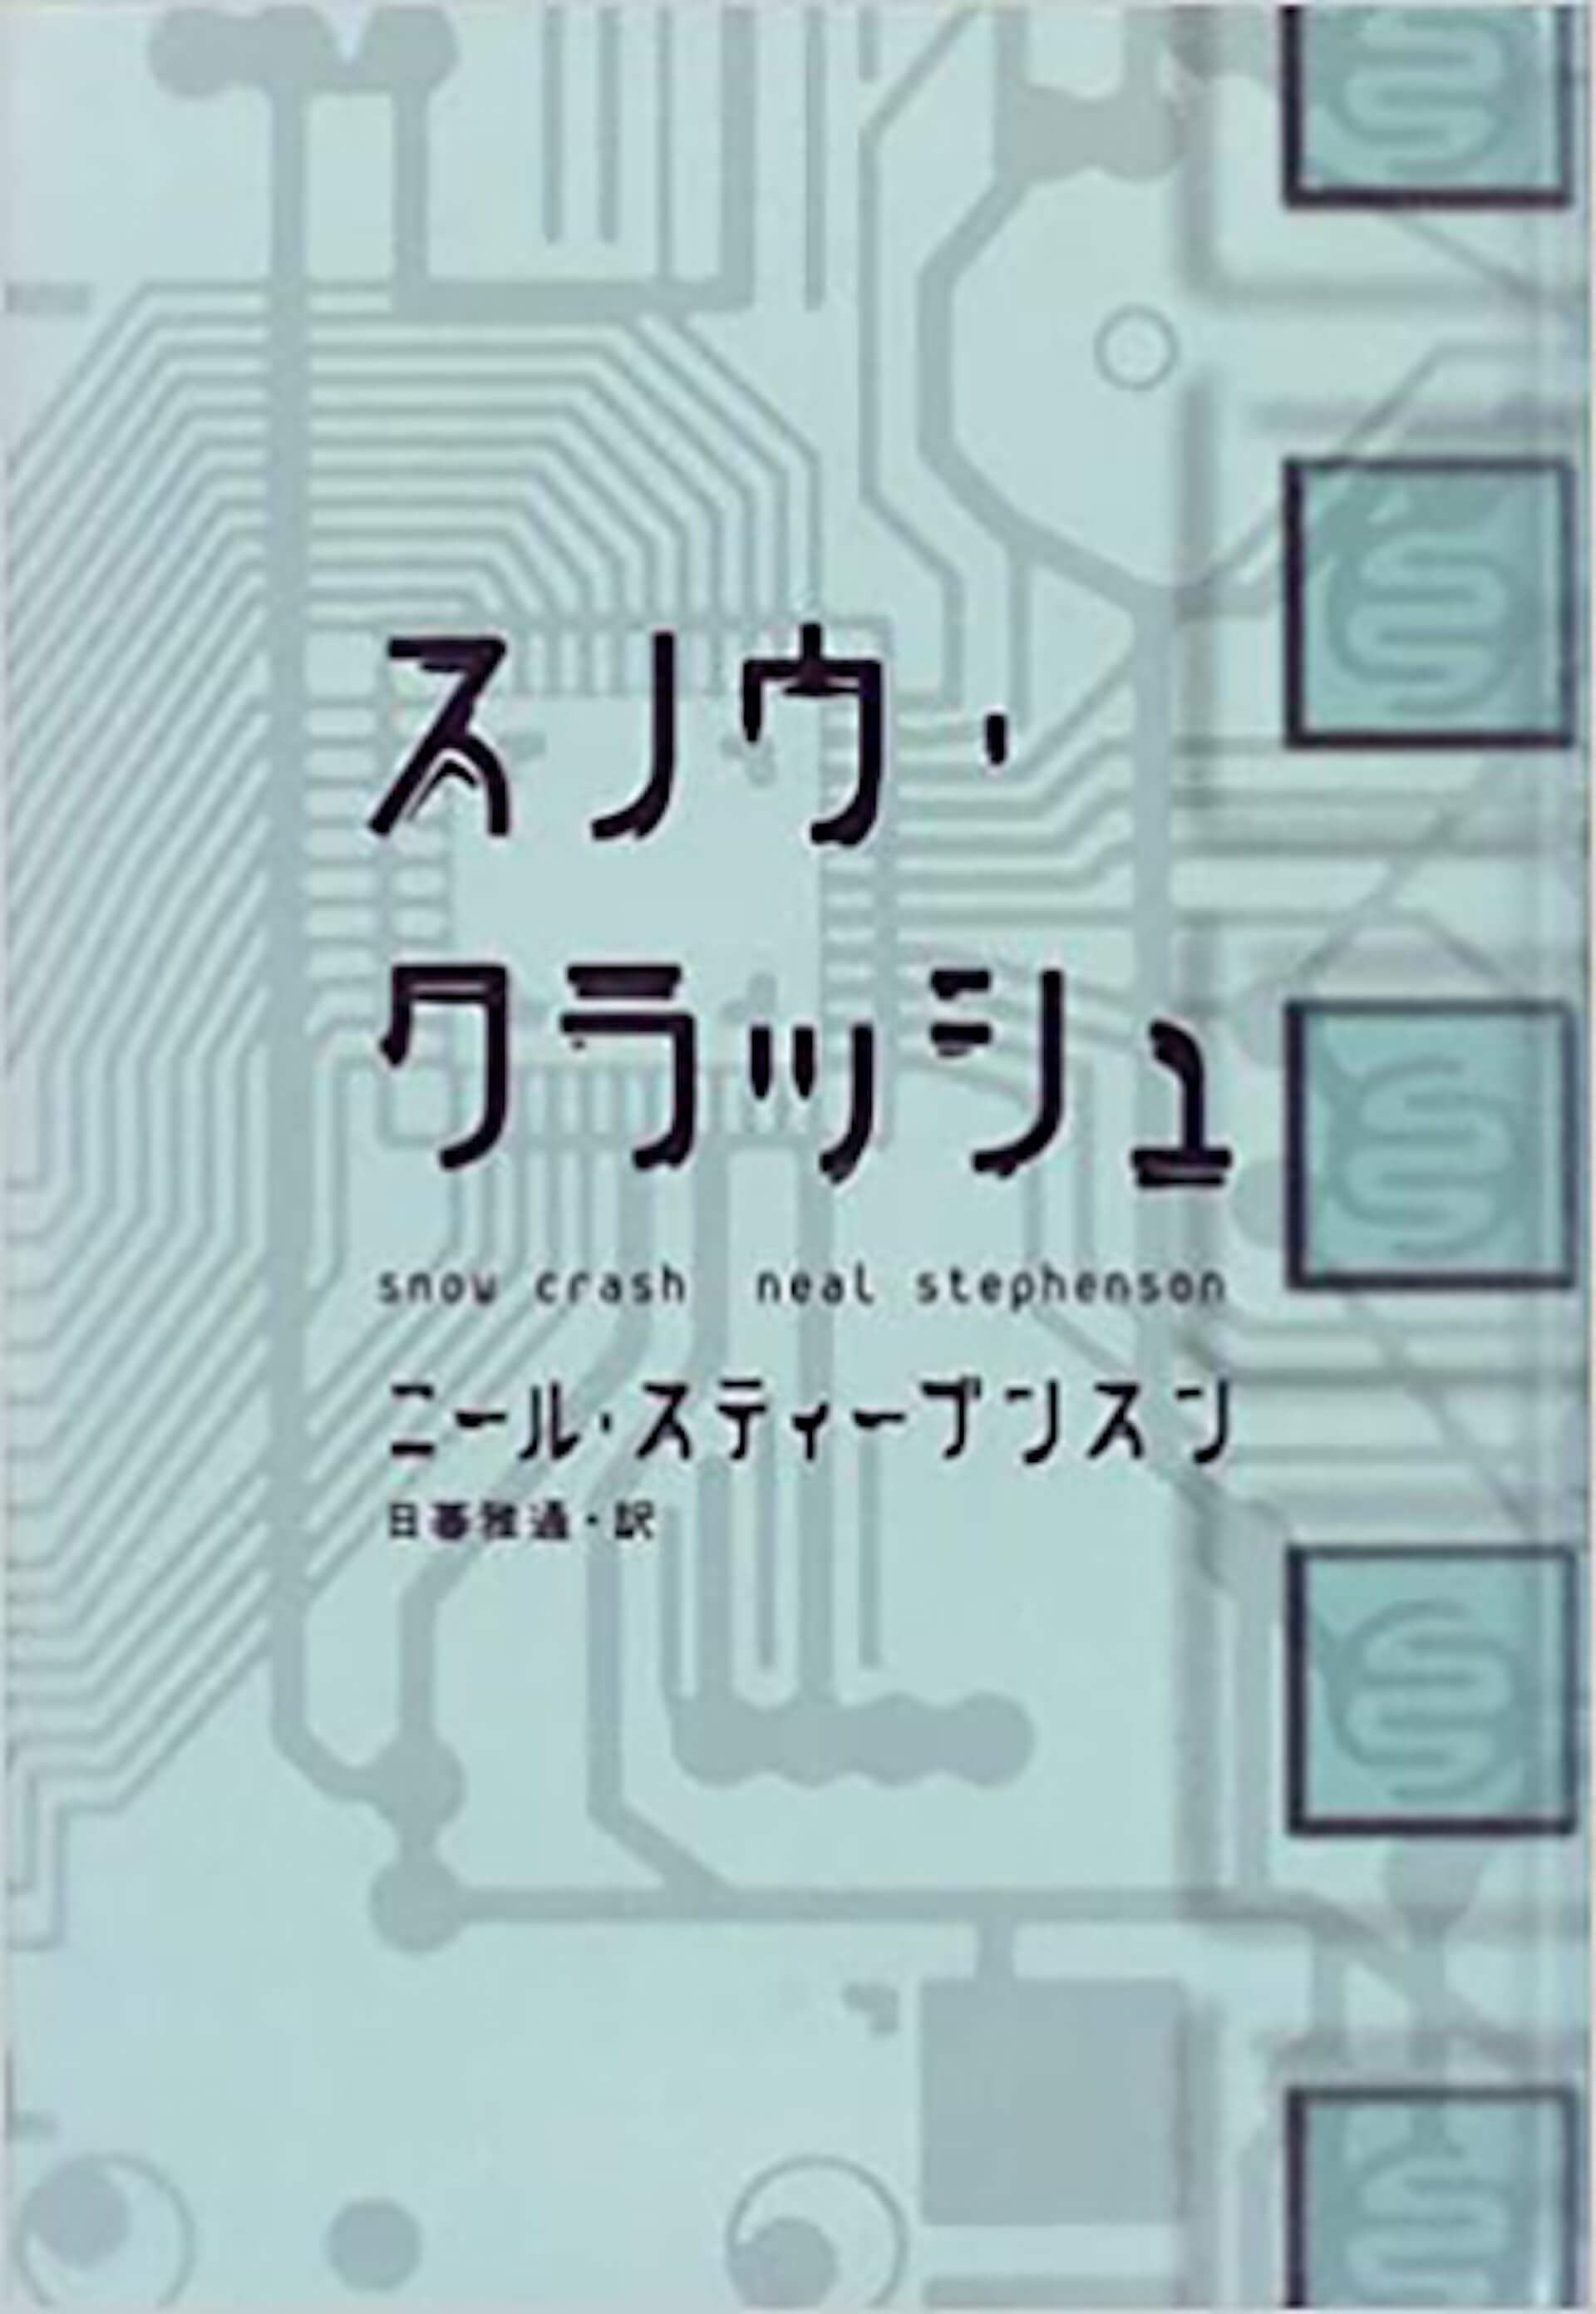 """SIW CONNECTION"" 登壇者のオススメ本リストを更新!"